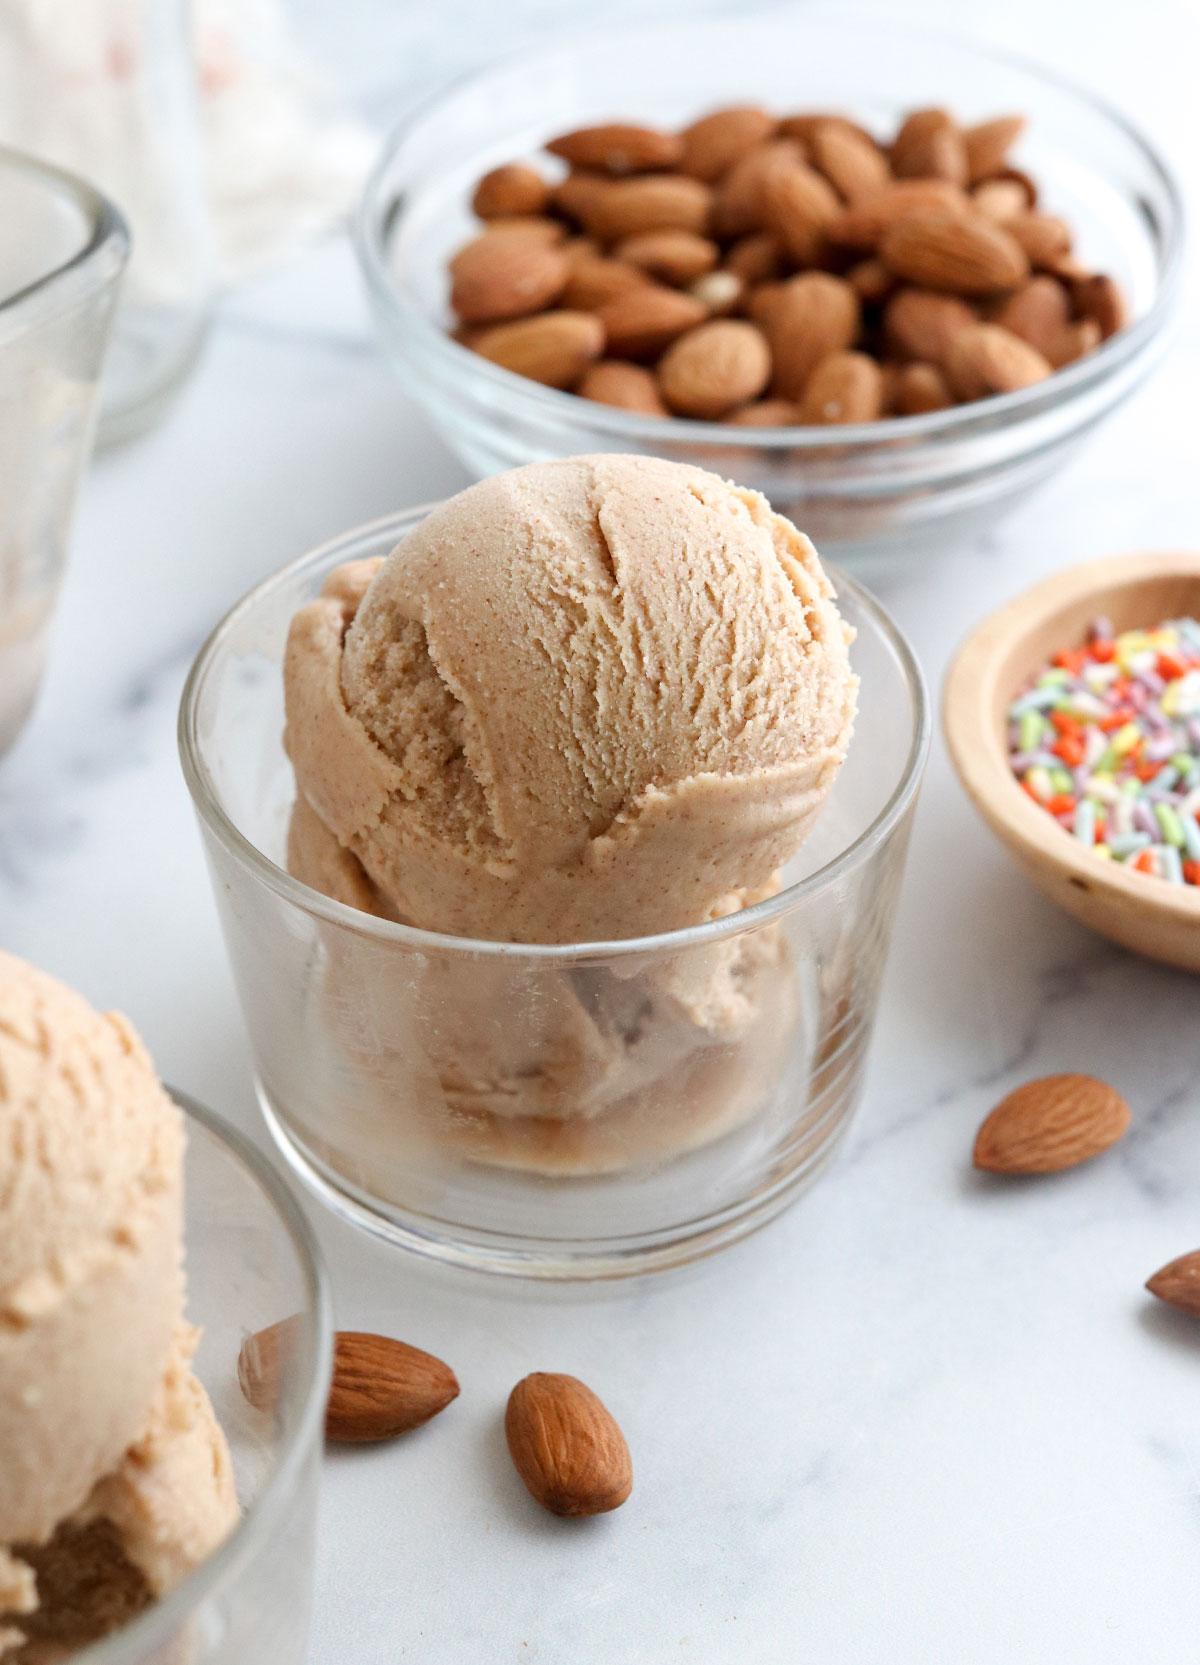 almond milk ice cream in glass dish